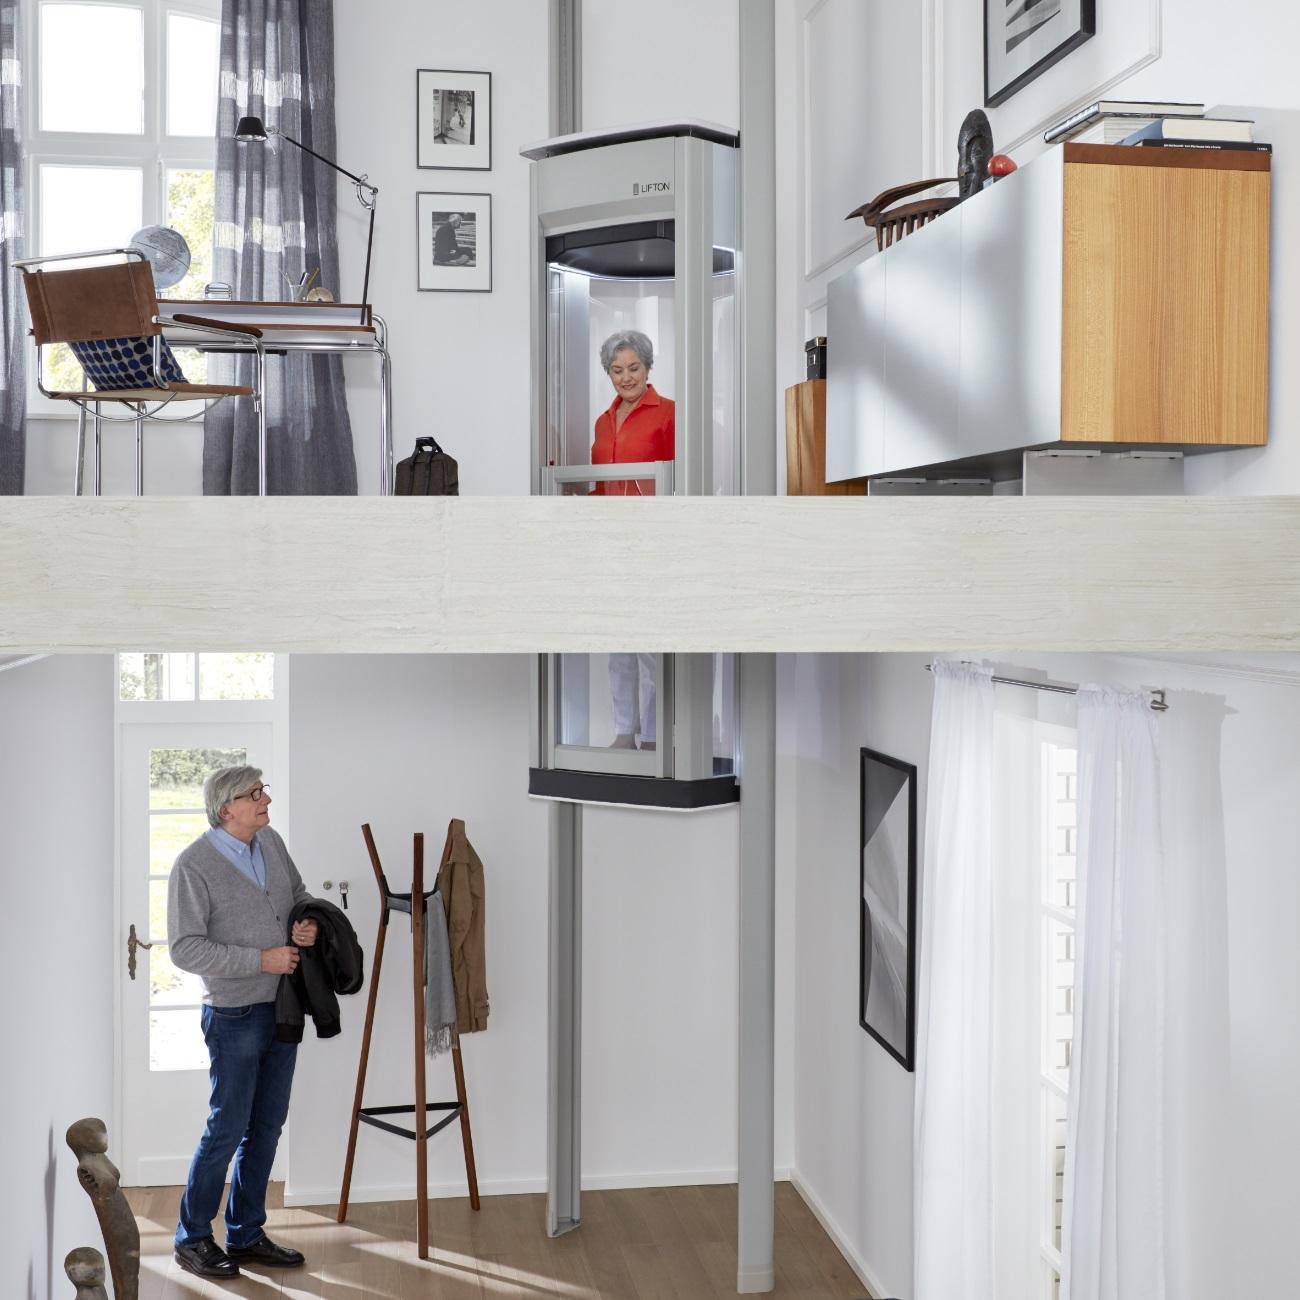 mit dem homelift hat das m hselige treppensteigen ein ende. Black Bedroom Furniture Sets. Home Design Ideas